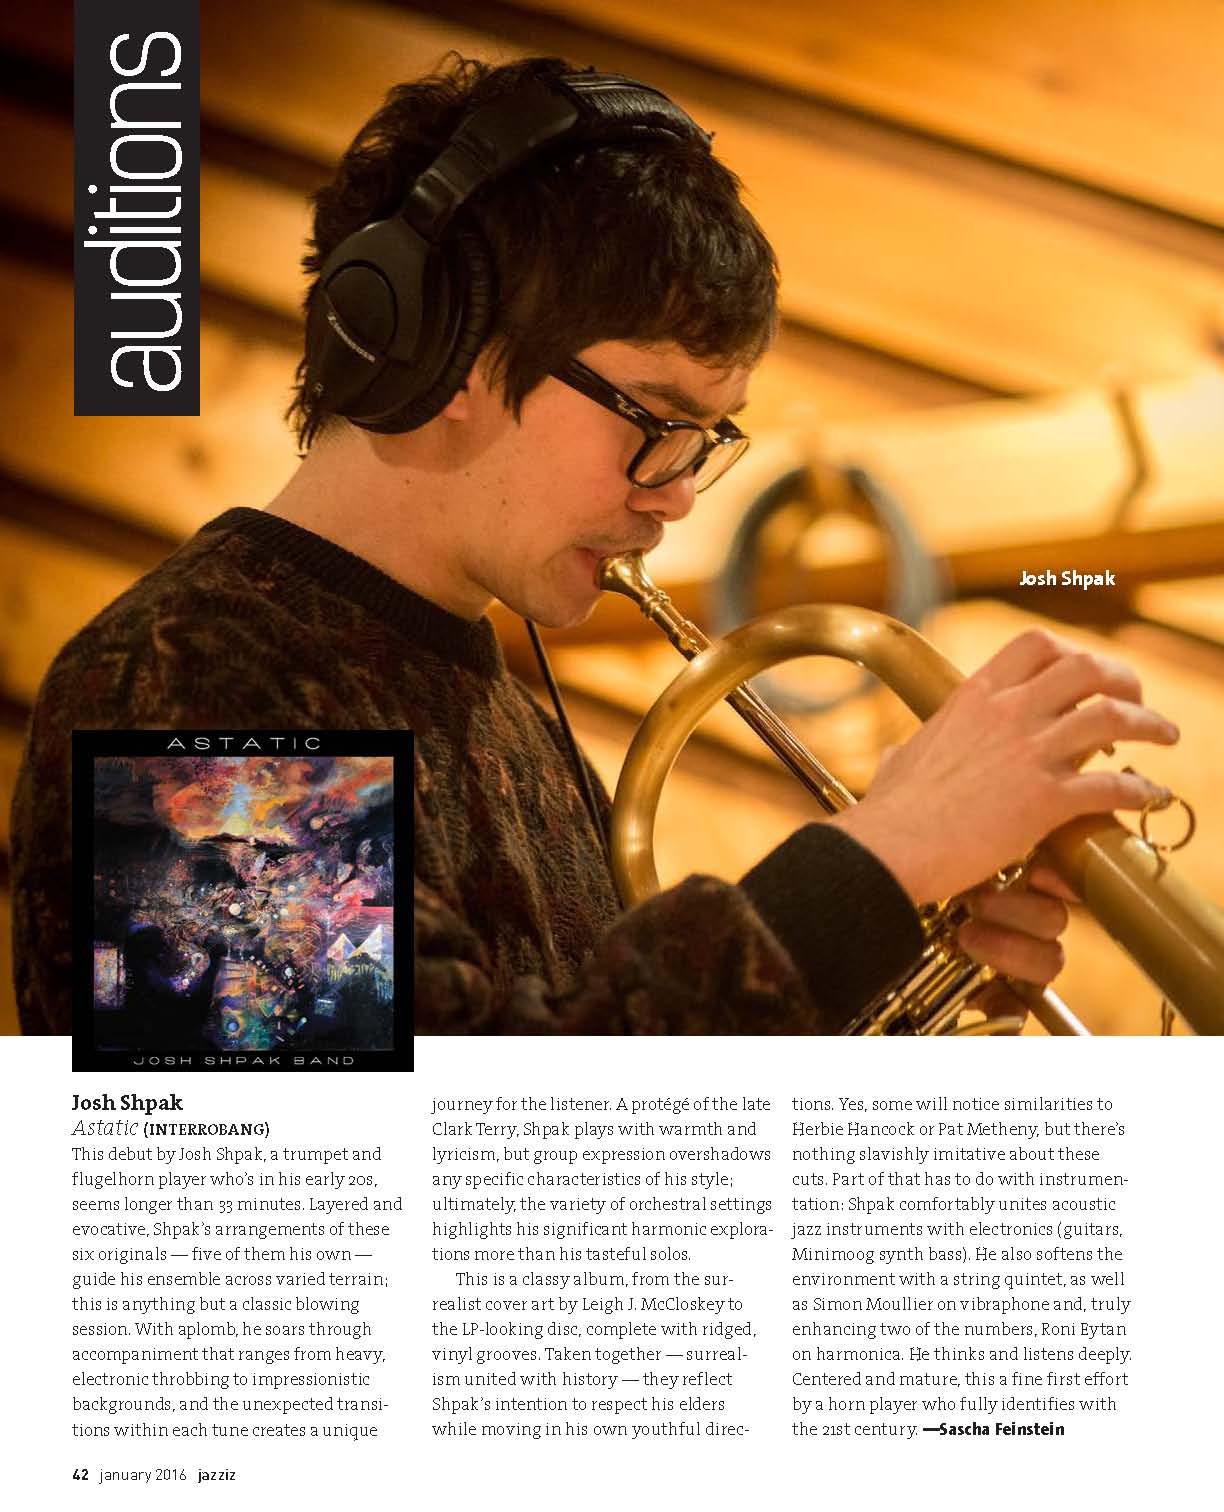 Beautiful spread in Jazziz for Josh Shpak's debut 'Astatic'